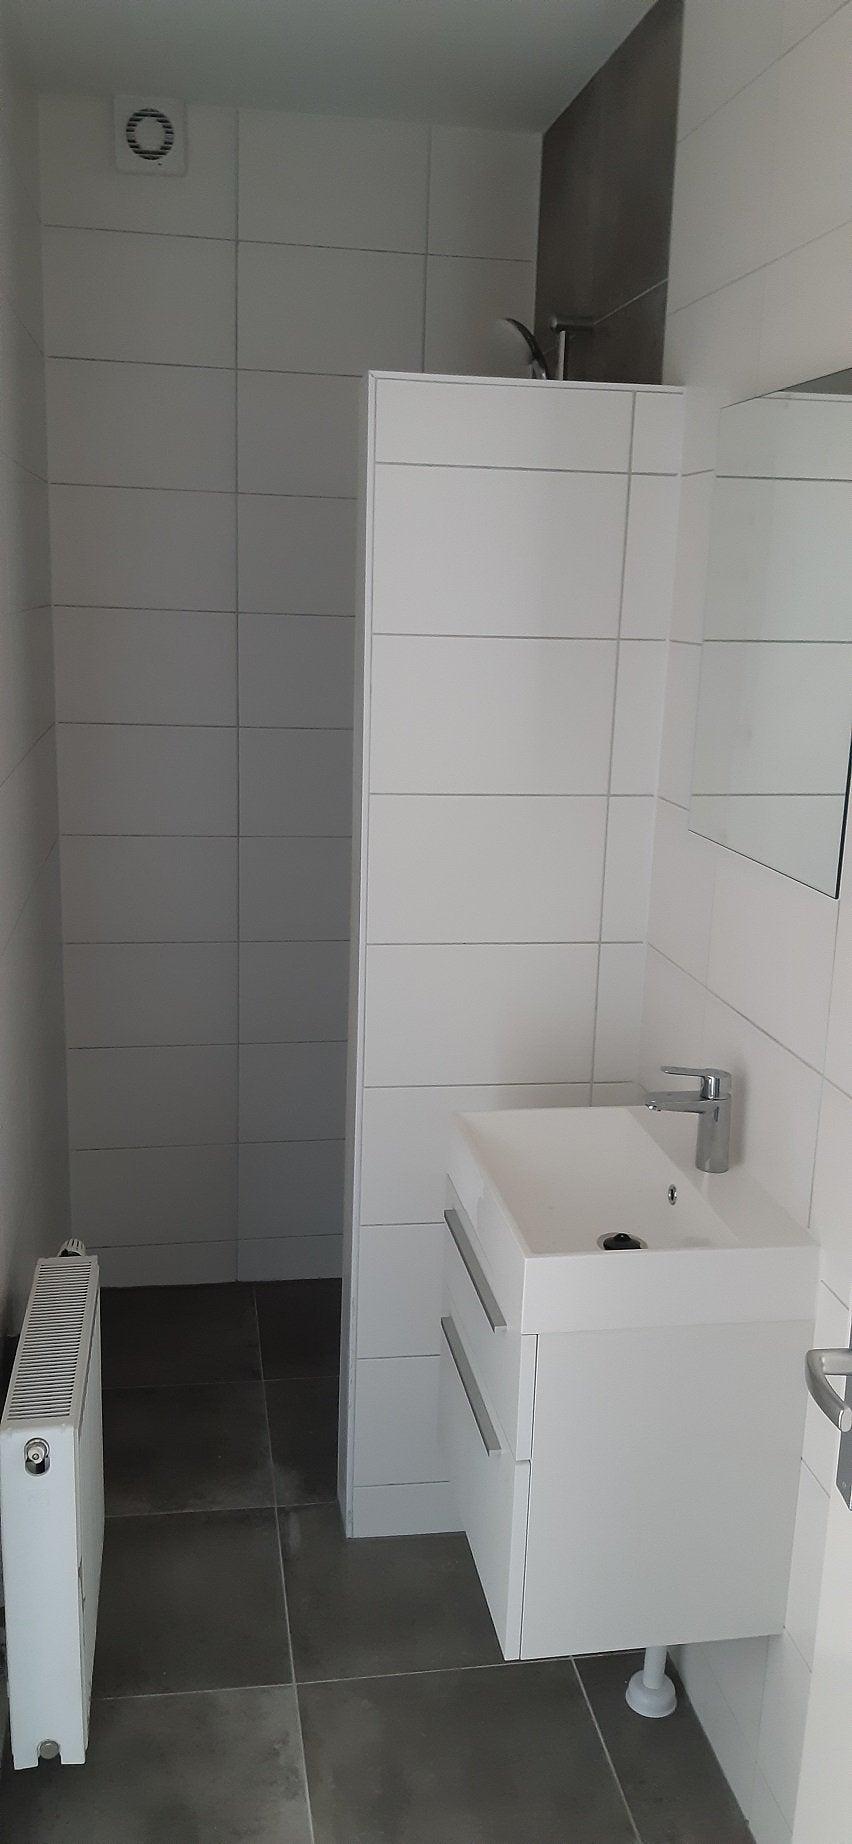 https://public.parariusoffice.nl/216/photos/huge/52177142.1568298698-848.jpg